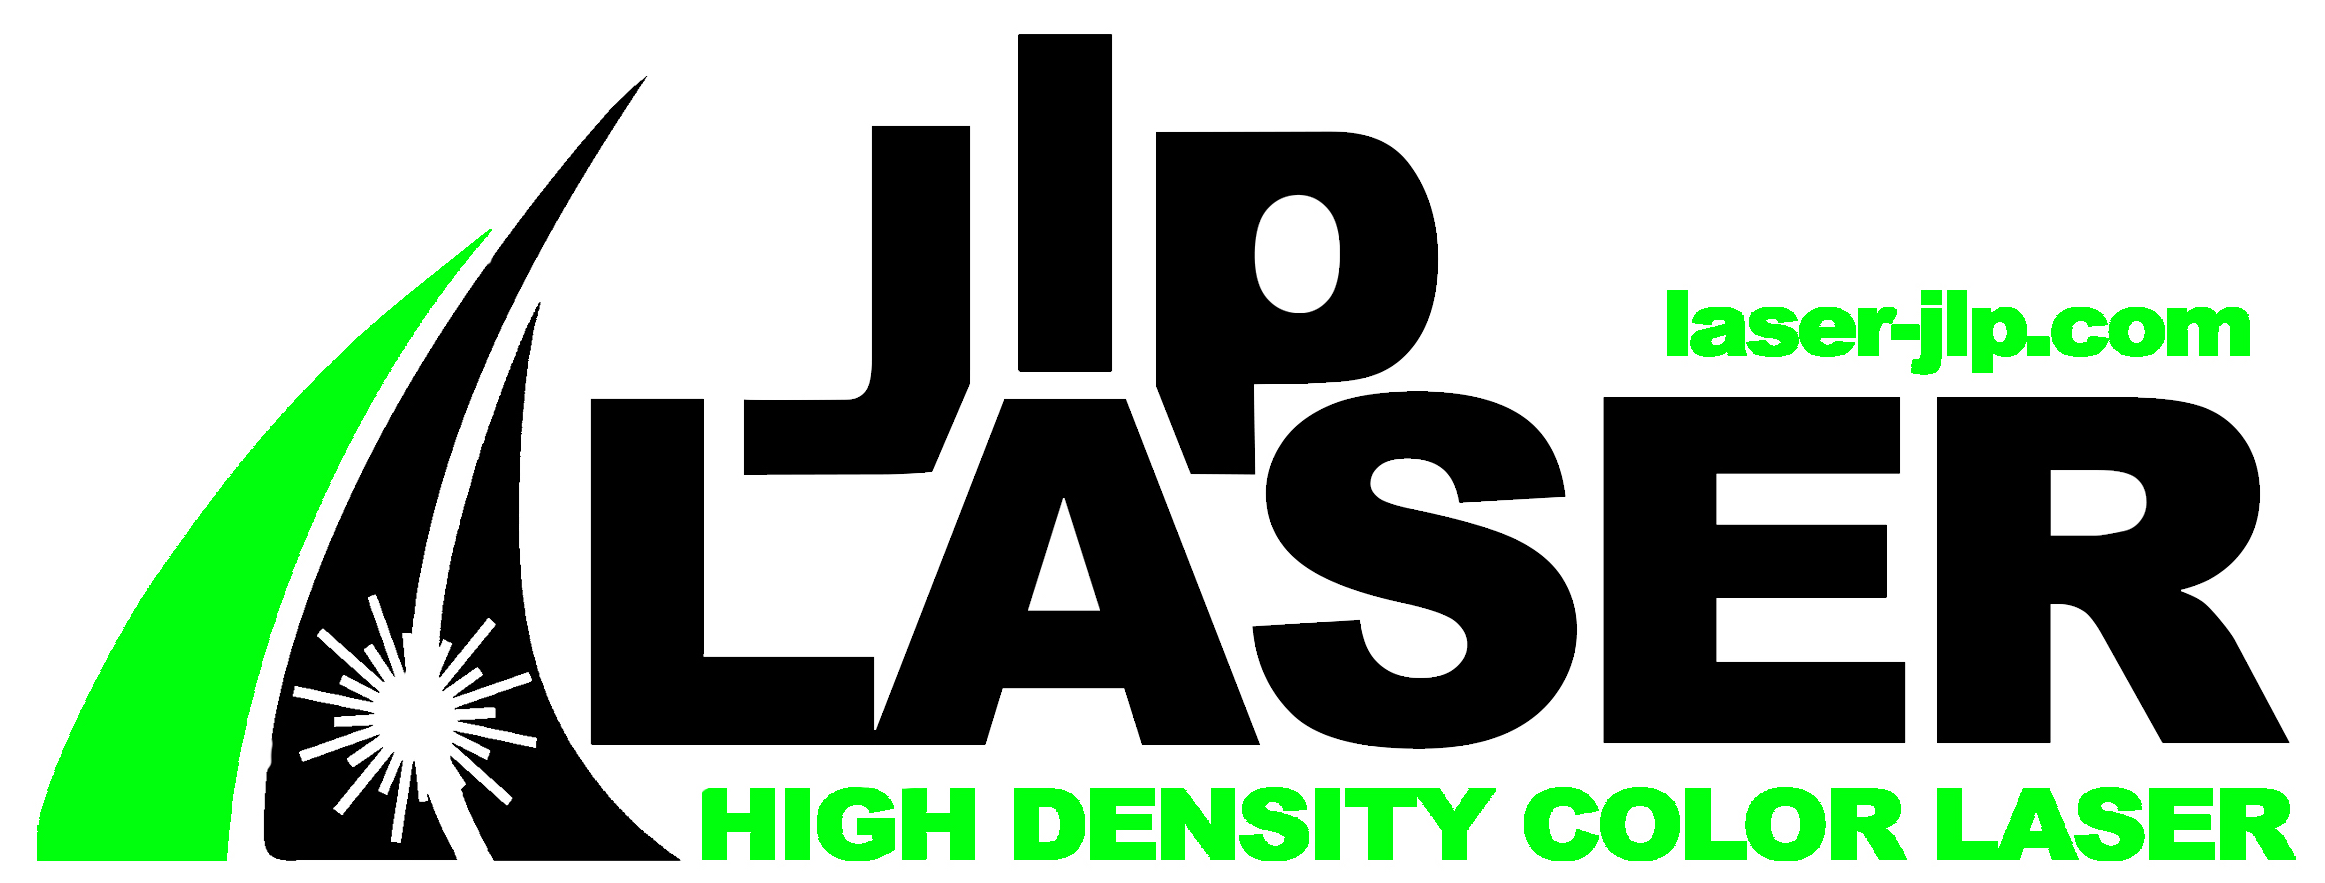 Laser JLP